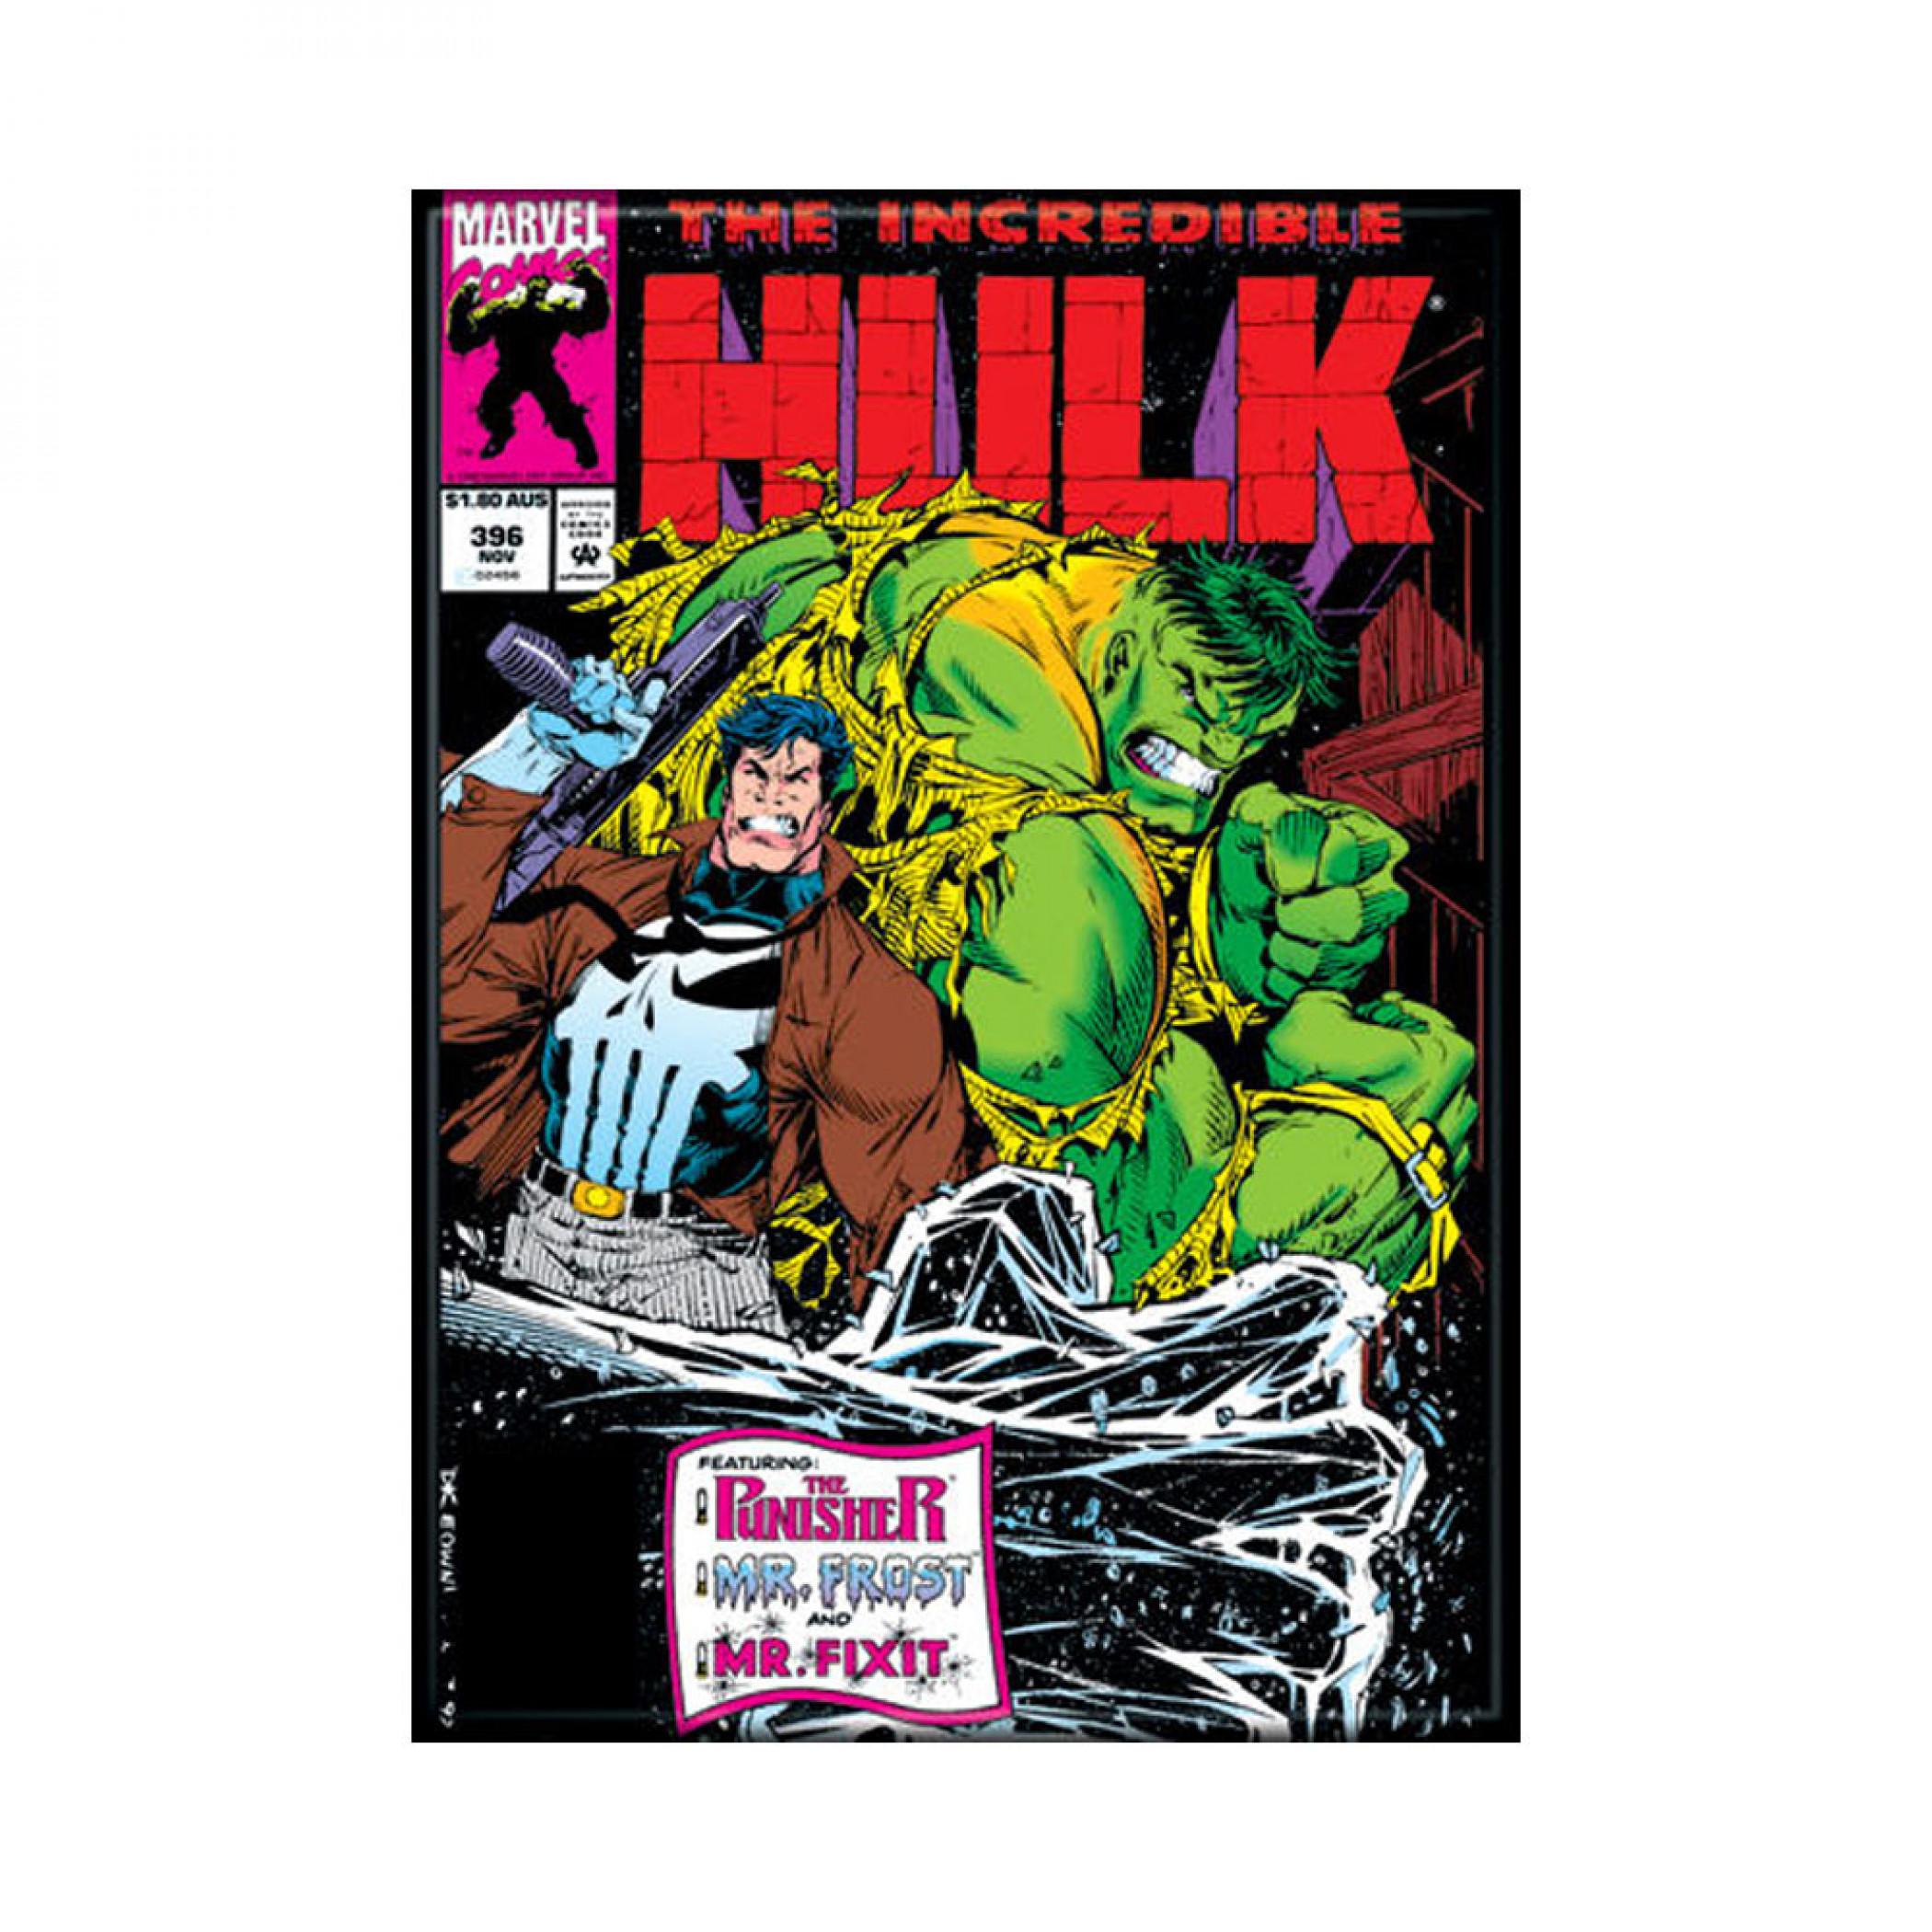 Incredible Hulk Comic Cover #396 Photo Magnet